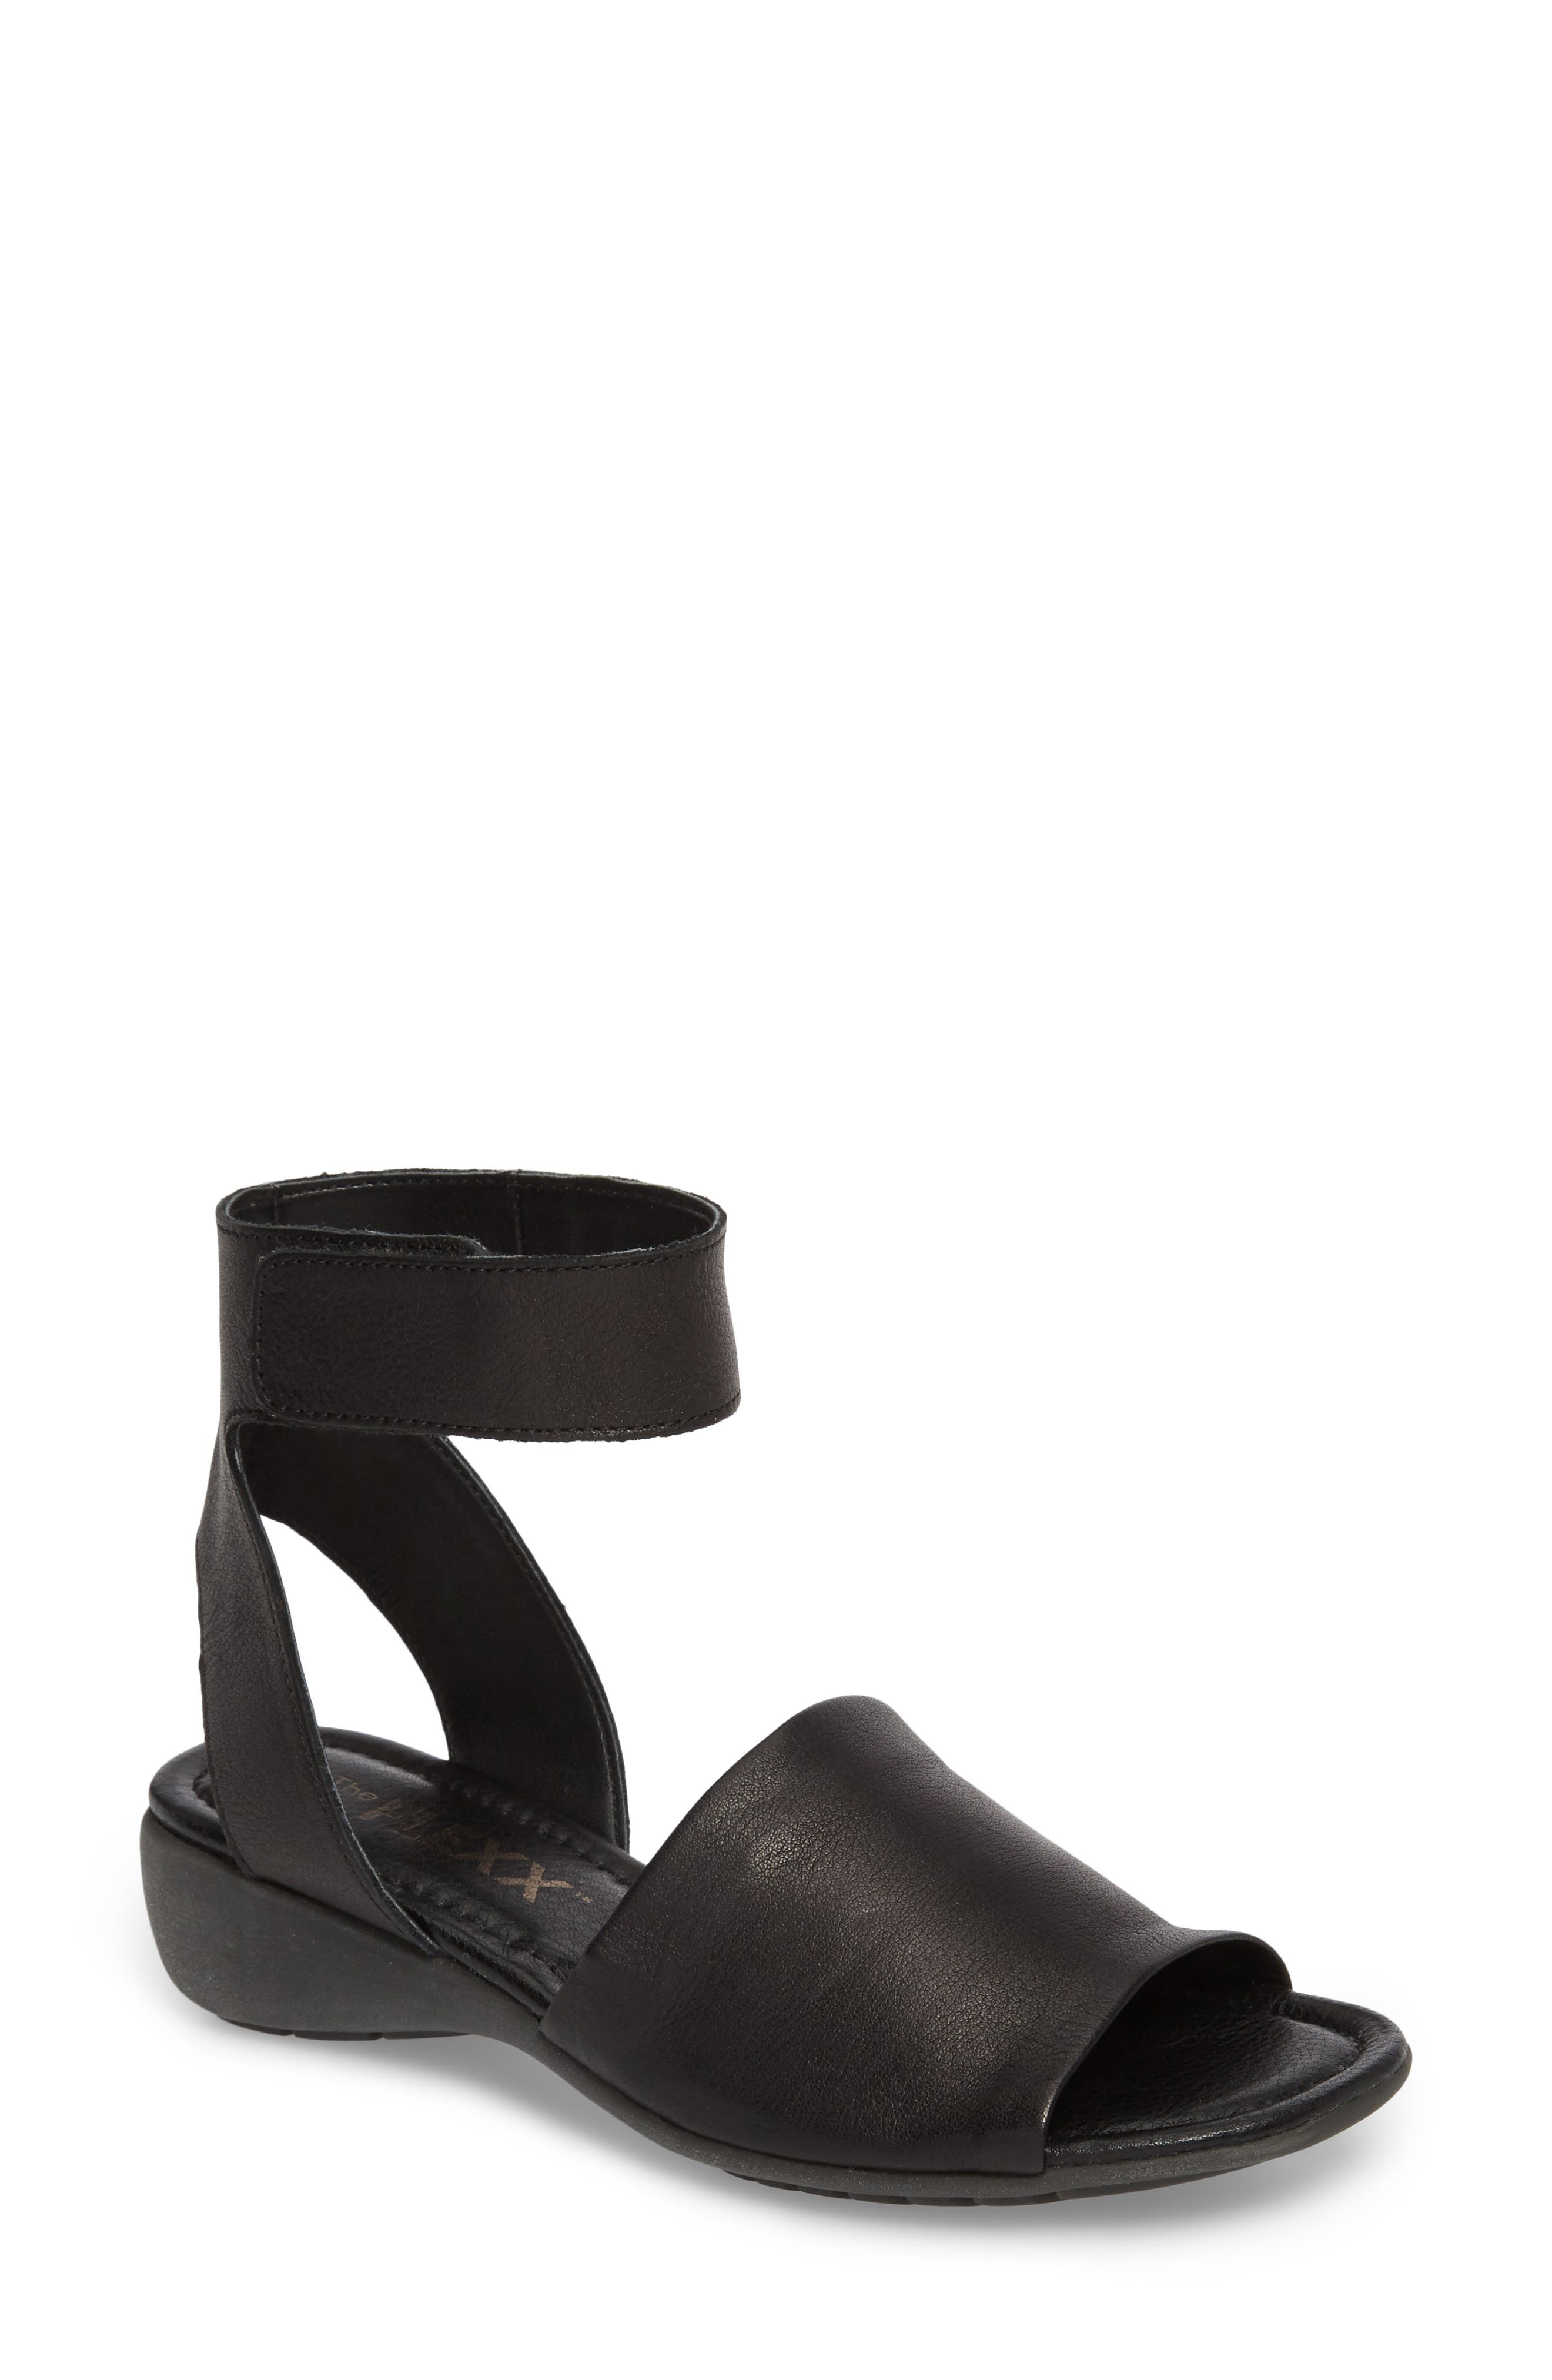 'Beglad' Leather Ankle Strap Sandal,                         Main,                         color, Black Vachetta Leather